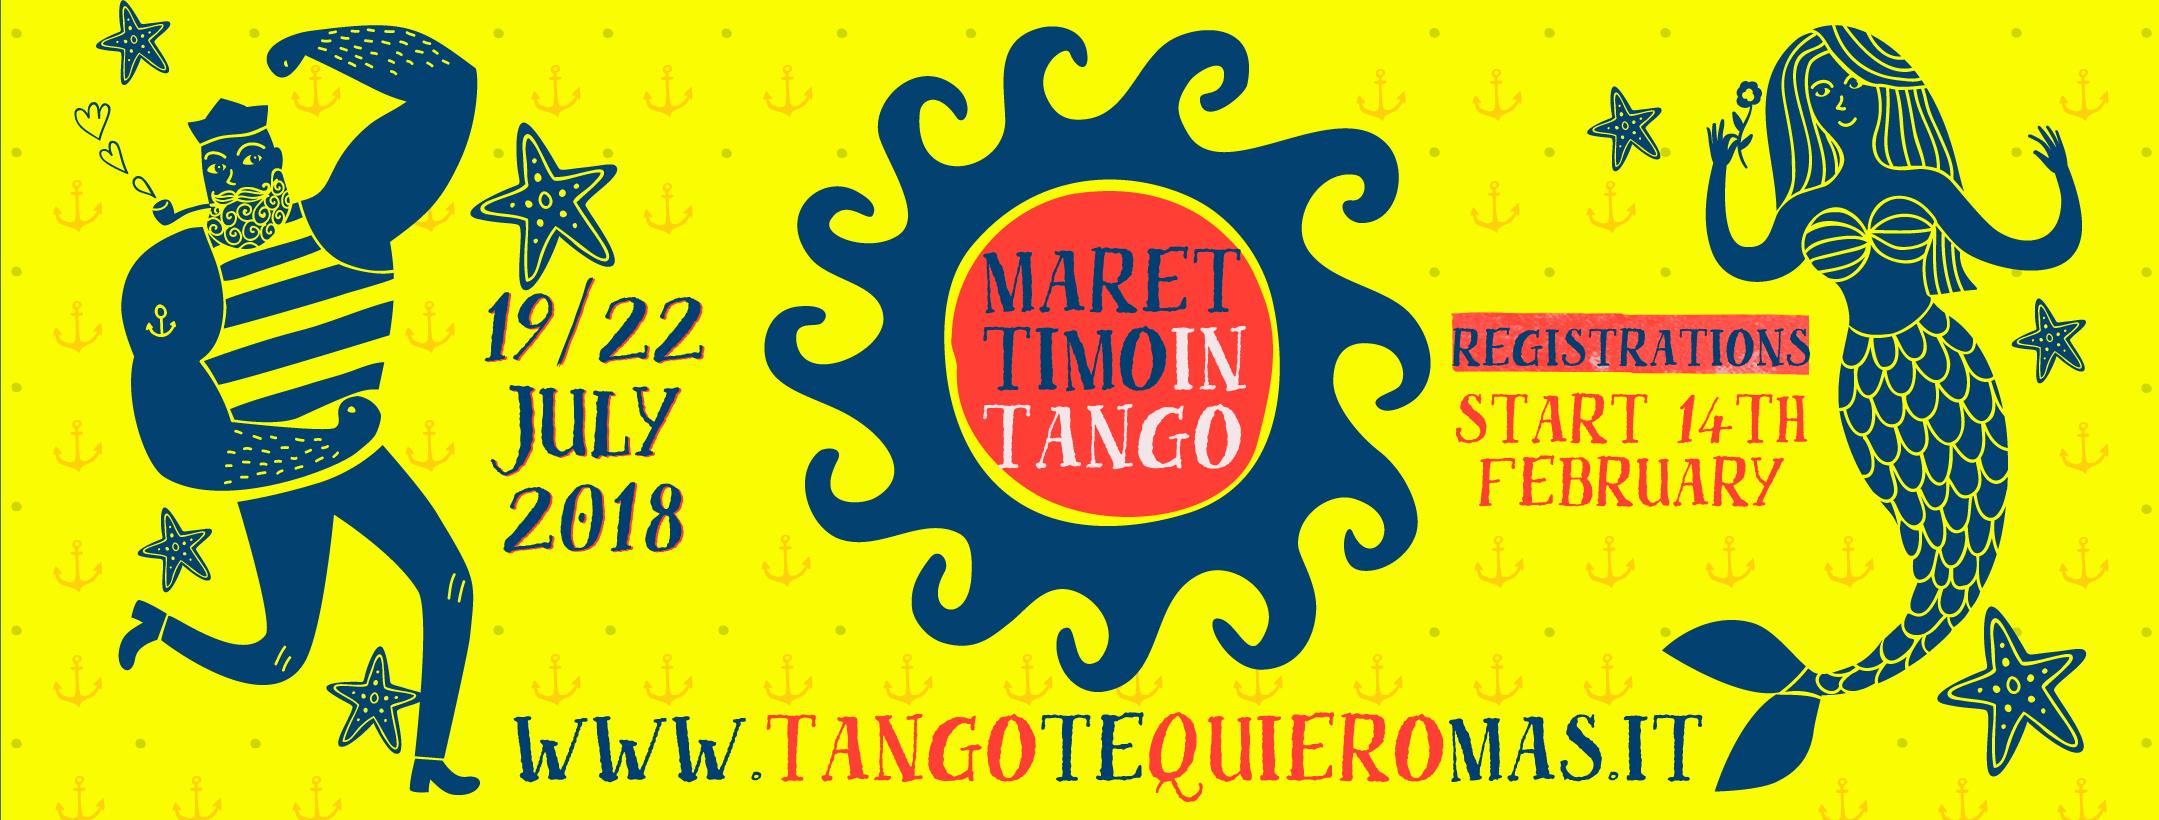 Tango Te Quiero Mas Front